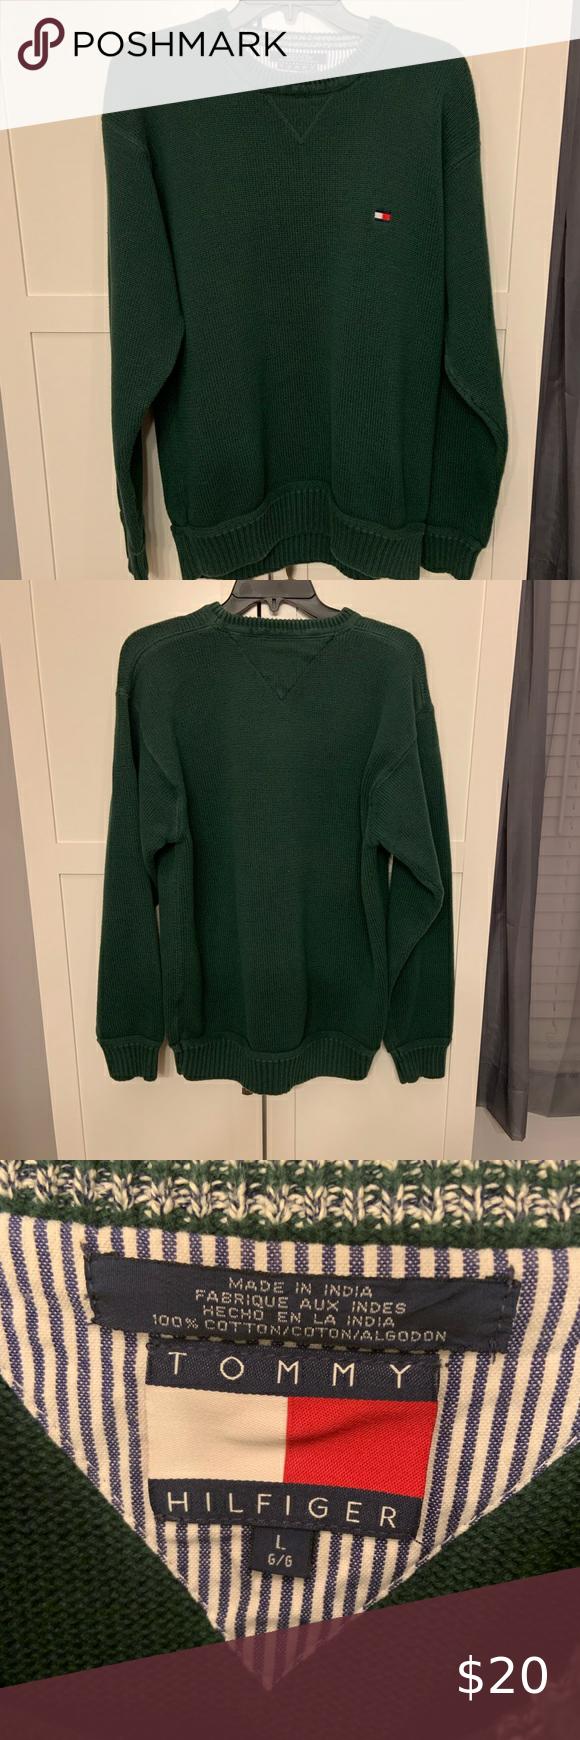 Men S Tommy Hilfiger Green Sweater Size Large Crochet Ladies Tops Tommy Hilfiger Crew Neck Sweater Men [ 1740 x 580 Pixel ]